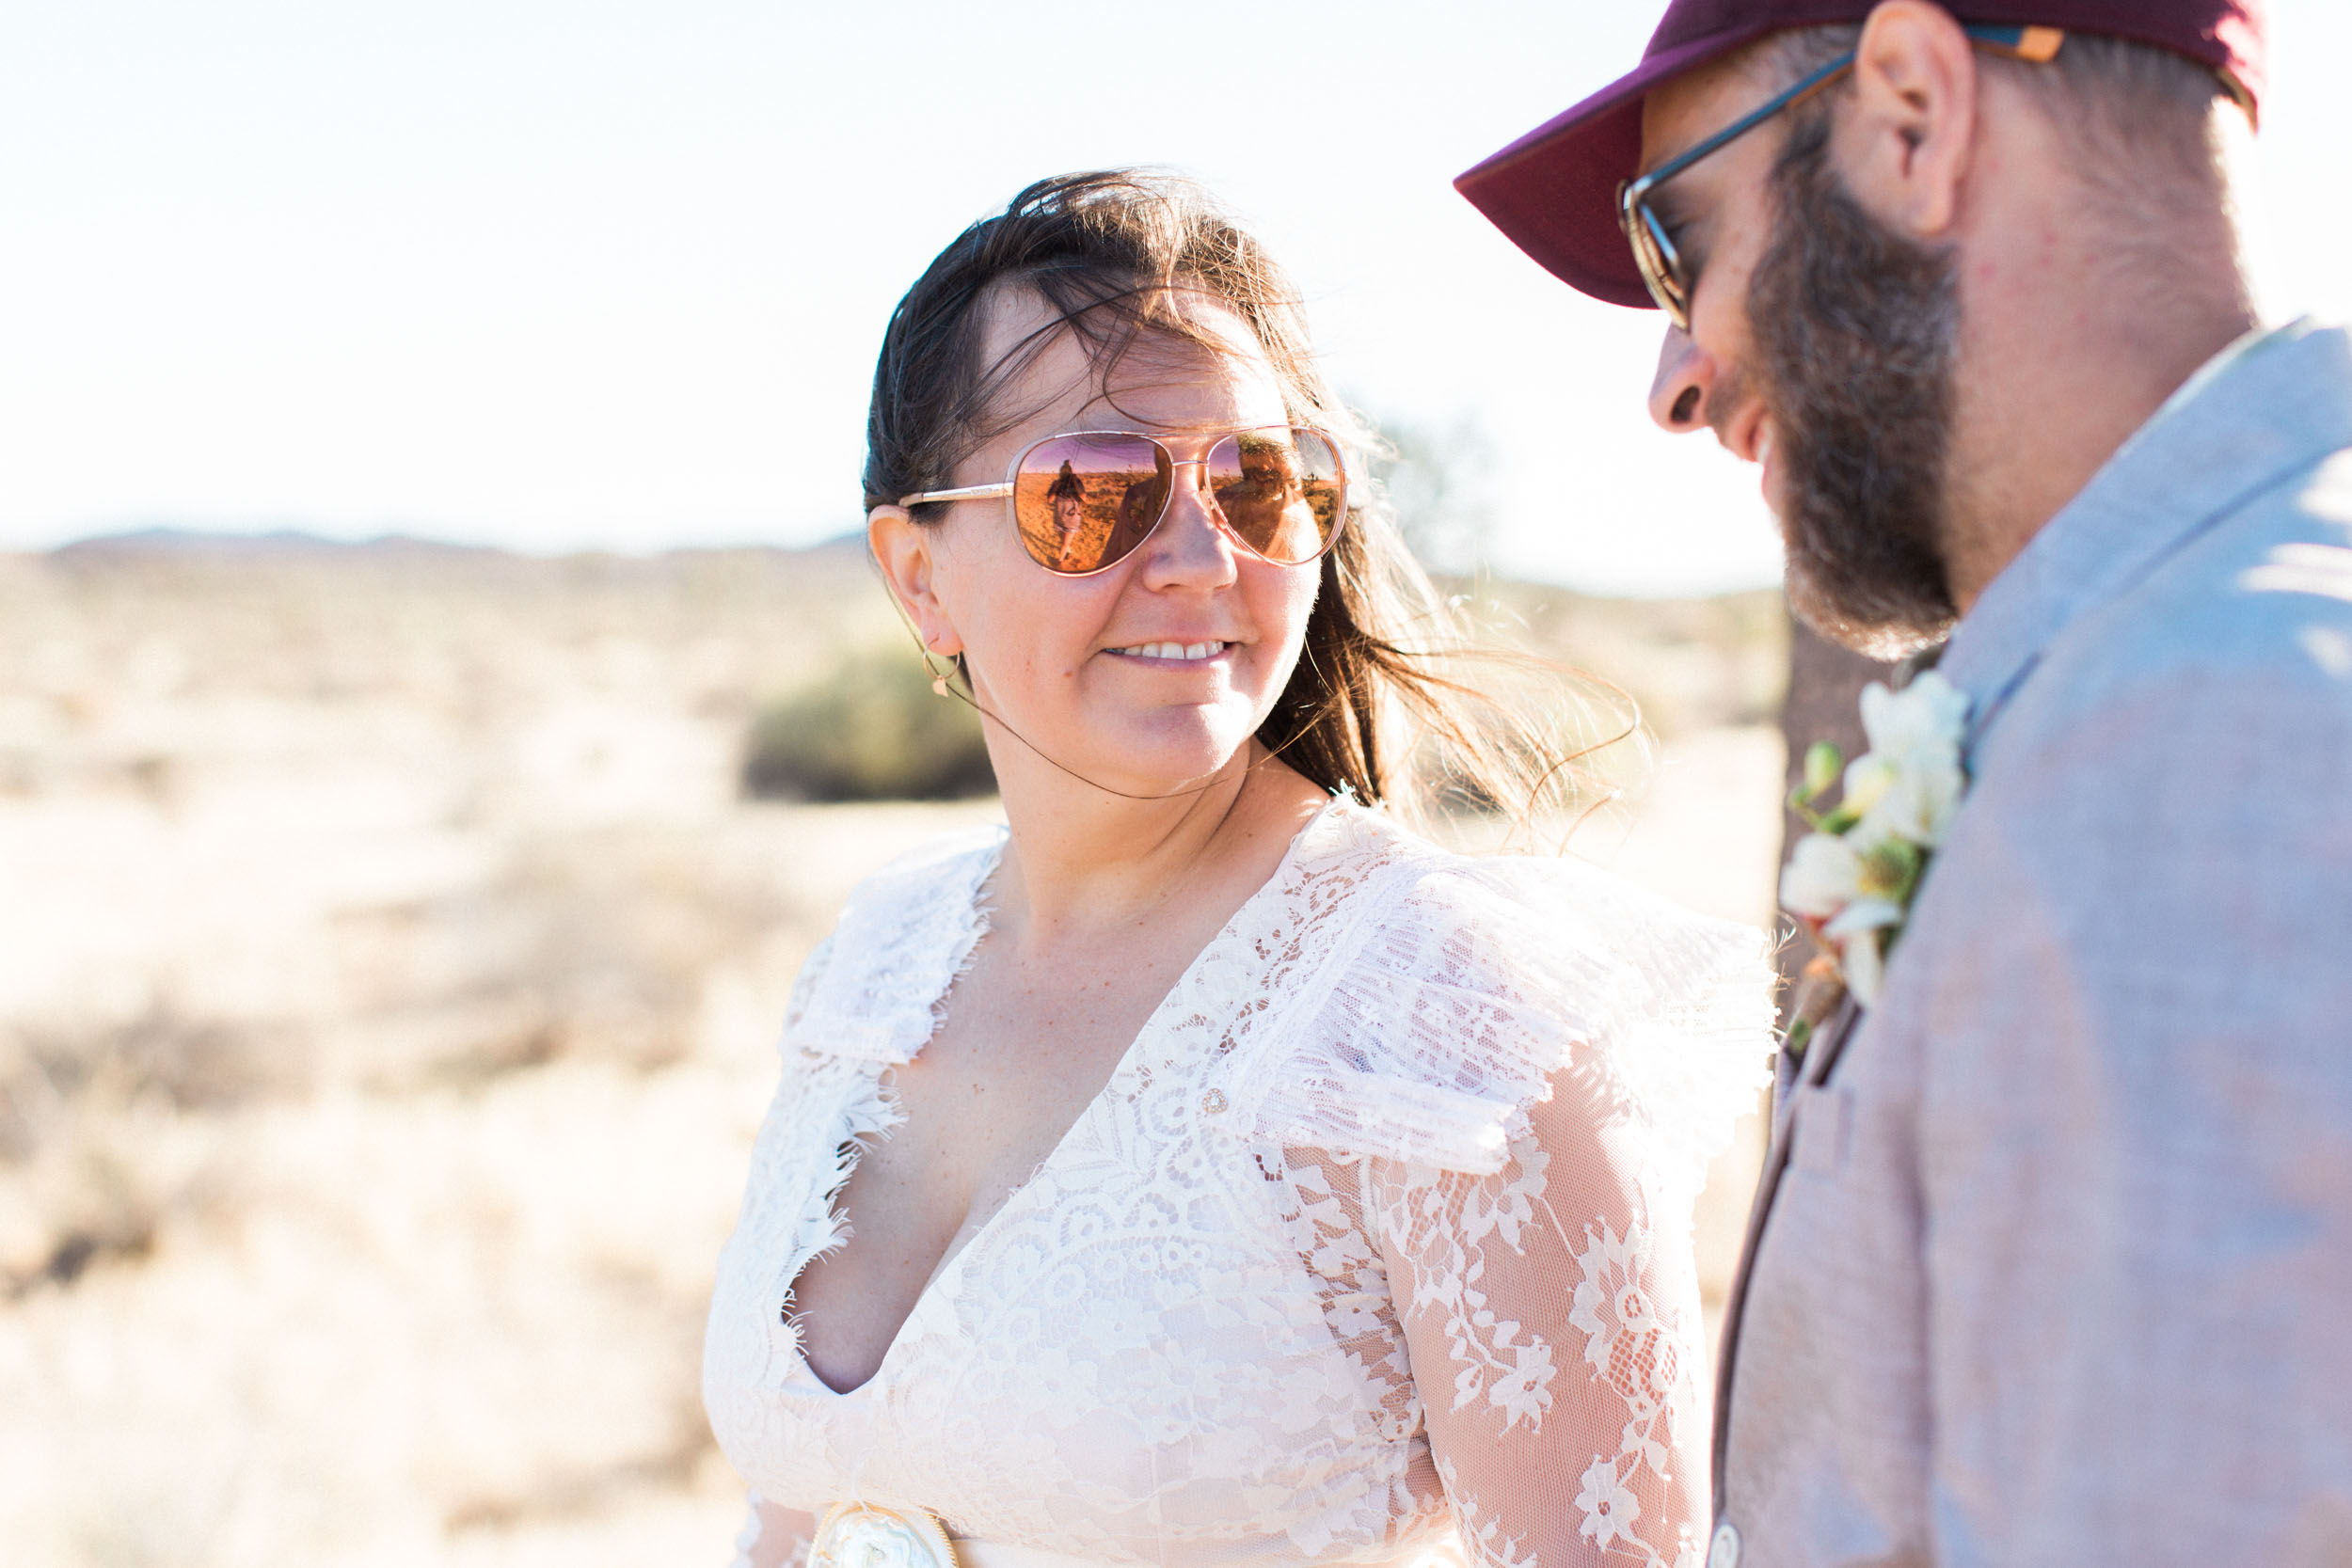 BKM-Photography-Joshua-Tree-Desert-Wedding-Elopement-0038.jpg